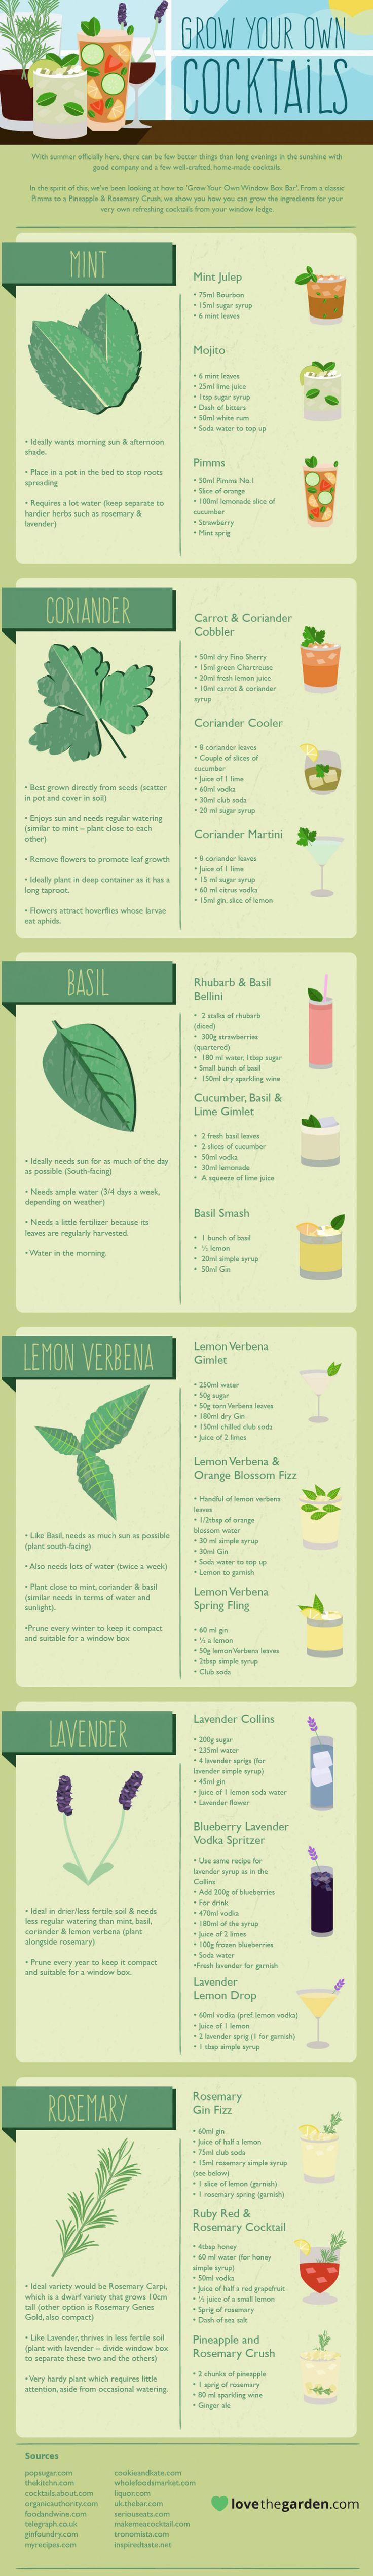 infographic, grow your own cocktail, cocktails, drink recipes, gardening, recipes, garden recipes, herbal cocktails, basil cocktails, lavender cocktails, cocktail recipes, http://inhabitat.com/grow-your-own-cocktails-drink-recipes-from-the-garden/?utm_content=bufferdd31e&utm_medium=social&utm_source=pinterest.com&utm_campaign=buffer